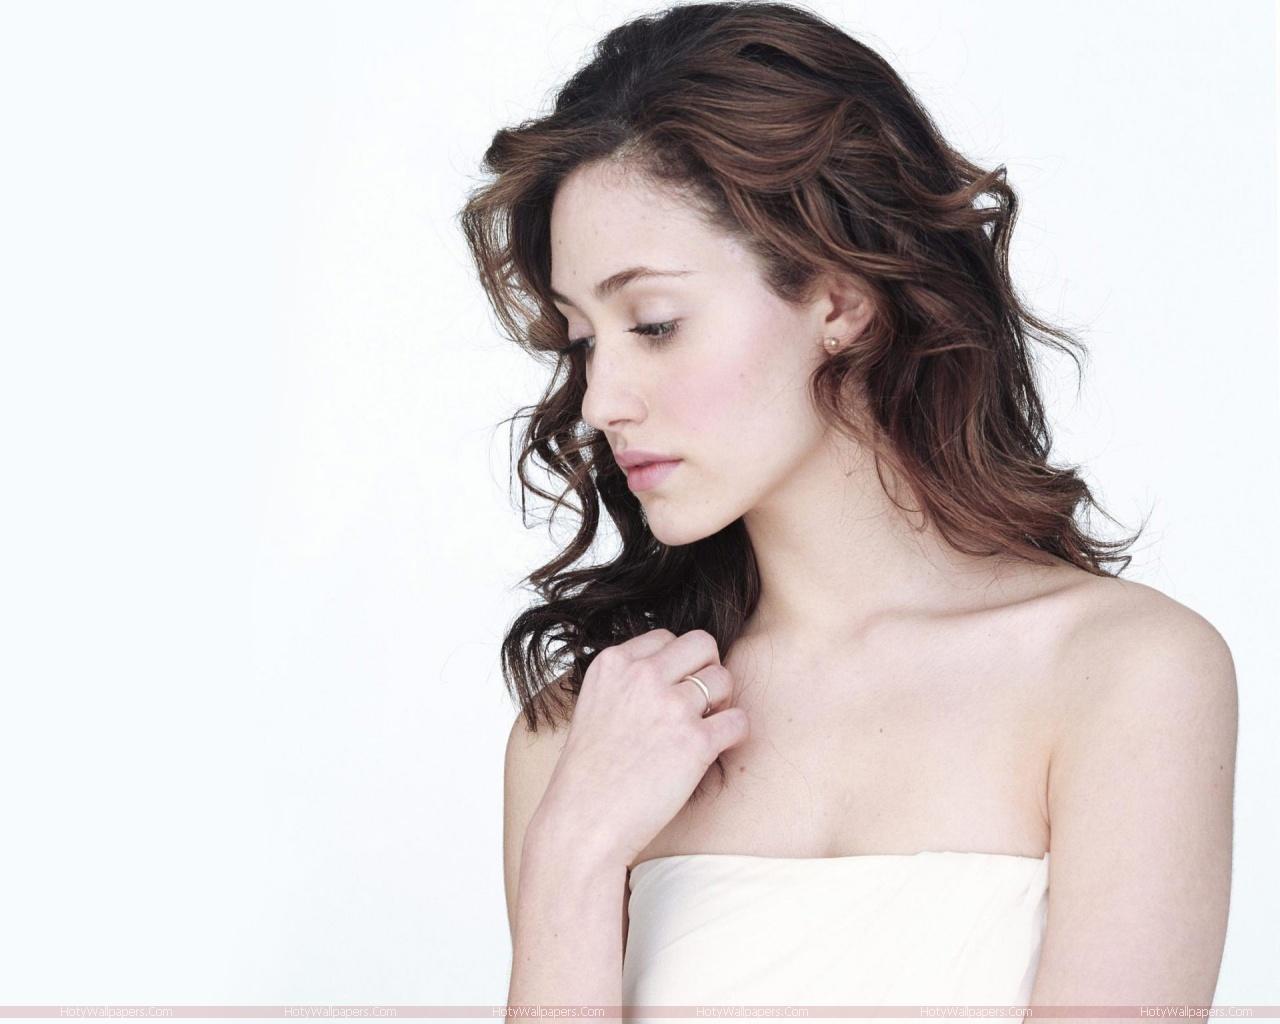 http://3.bp.blogspot.com/-l7L9kn59RY0/TlZpaGF-BtI/AAAAAAAAJug/cKwECoR63u0/s1600/hollywood_actress_Emmy_Rossum_glamour-wallpaper.jpg